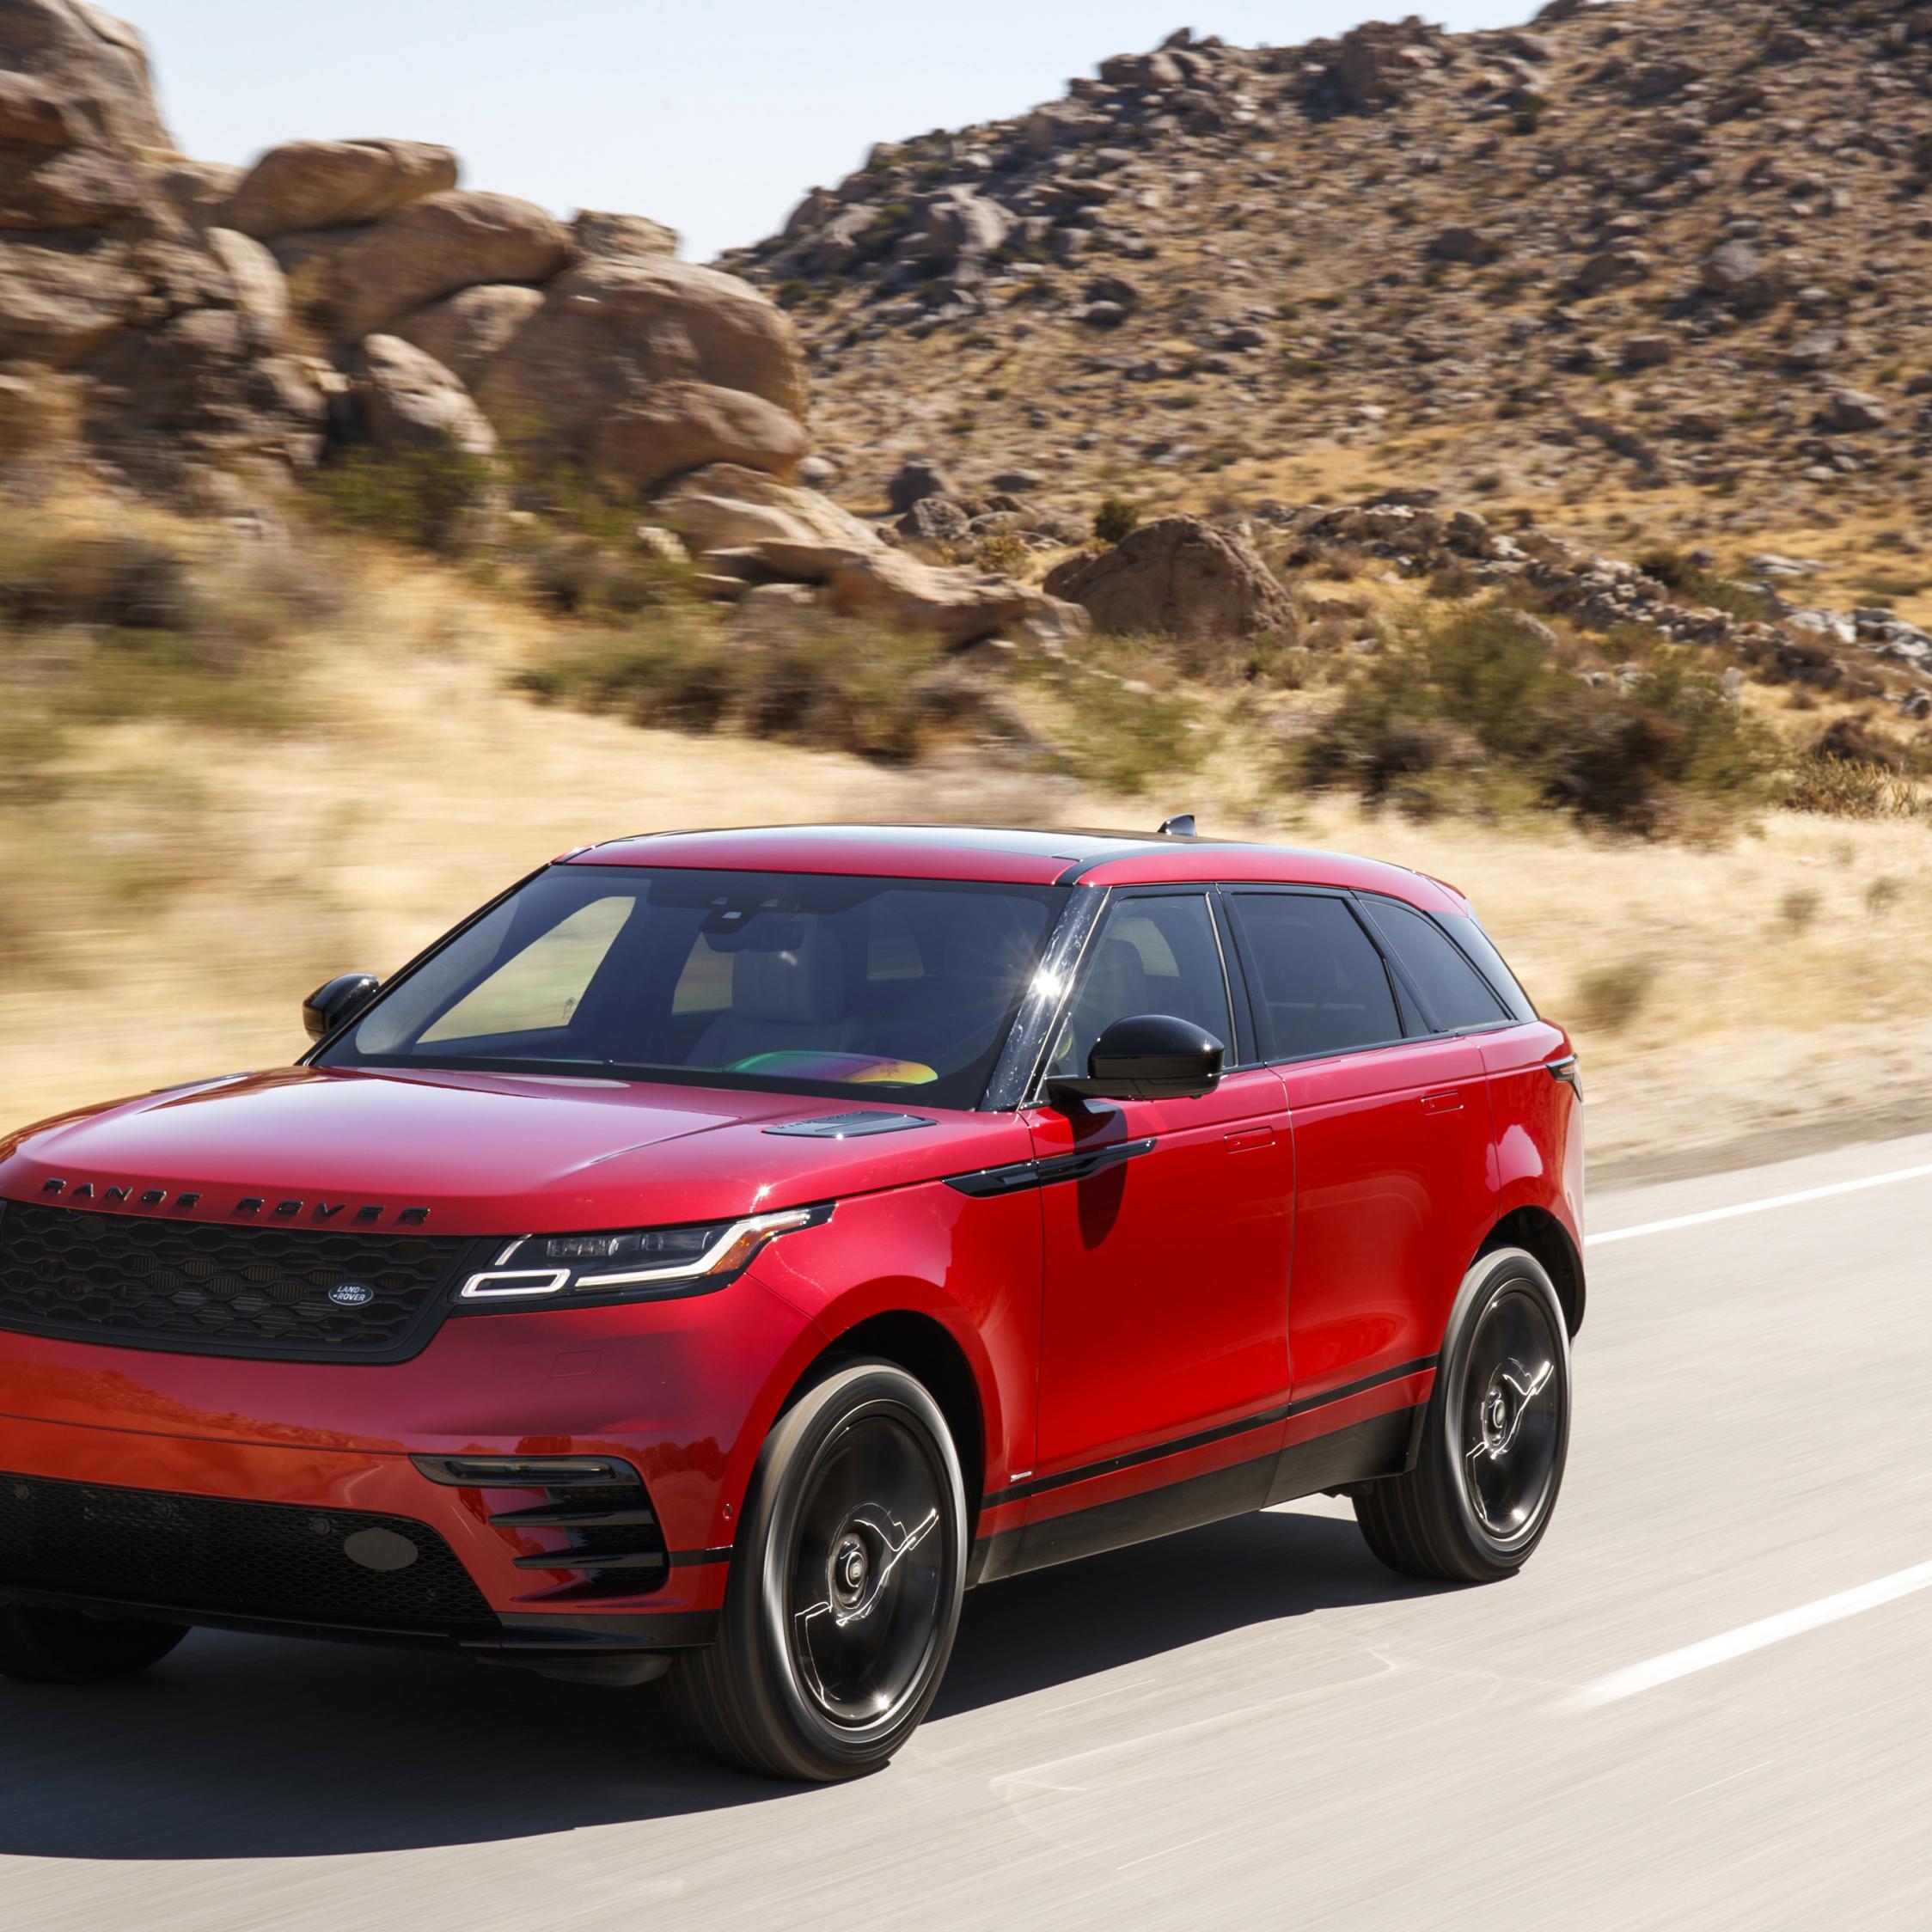 Land Rover Car Wallpaper: 2018 Range Rover Velar R Dynamic, HD 4K Wallpaper